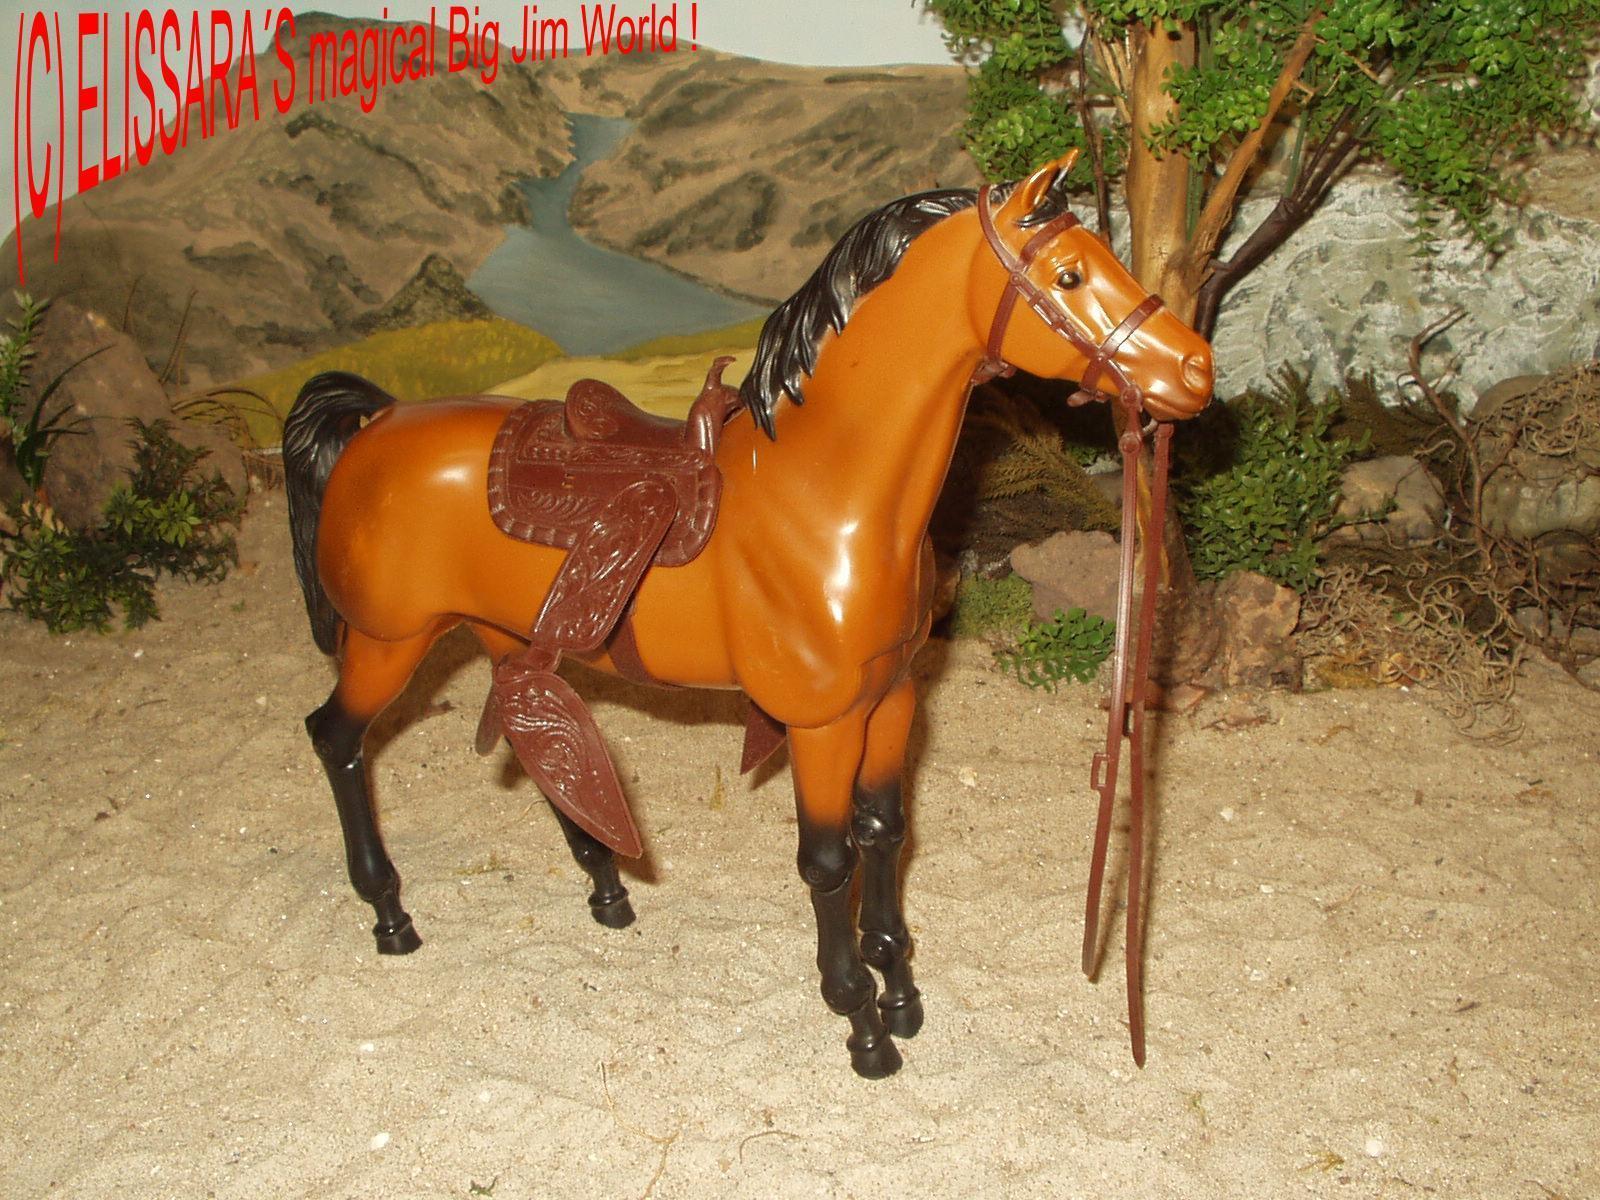 Big Jim   Barbie Pferd in rarer Curry Farbe   Horse   Cavallo   Cheval - Mattel